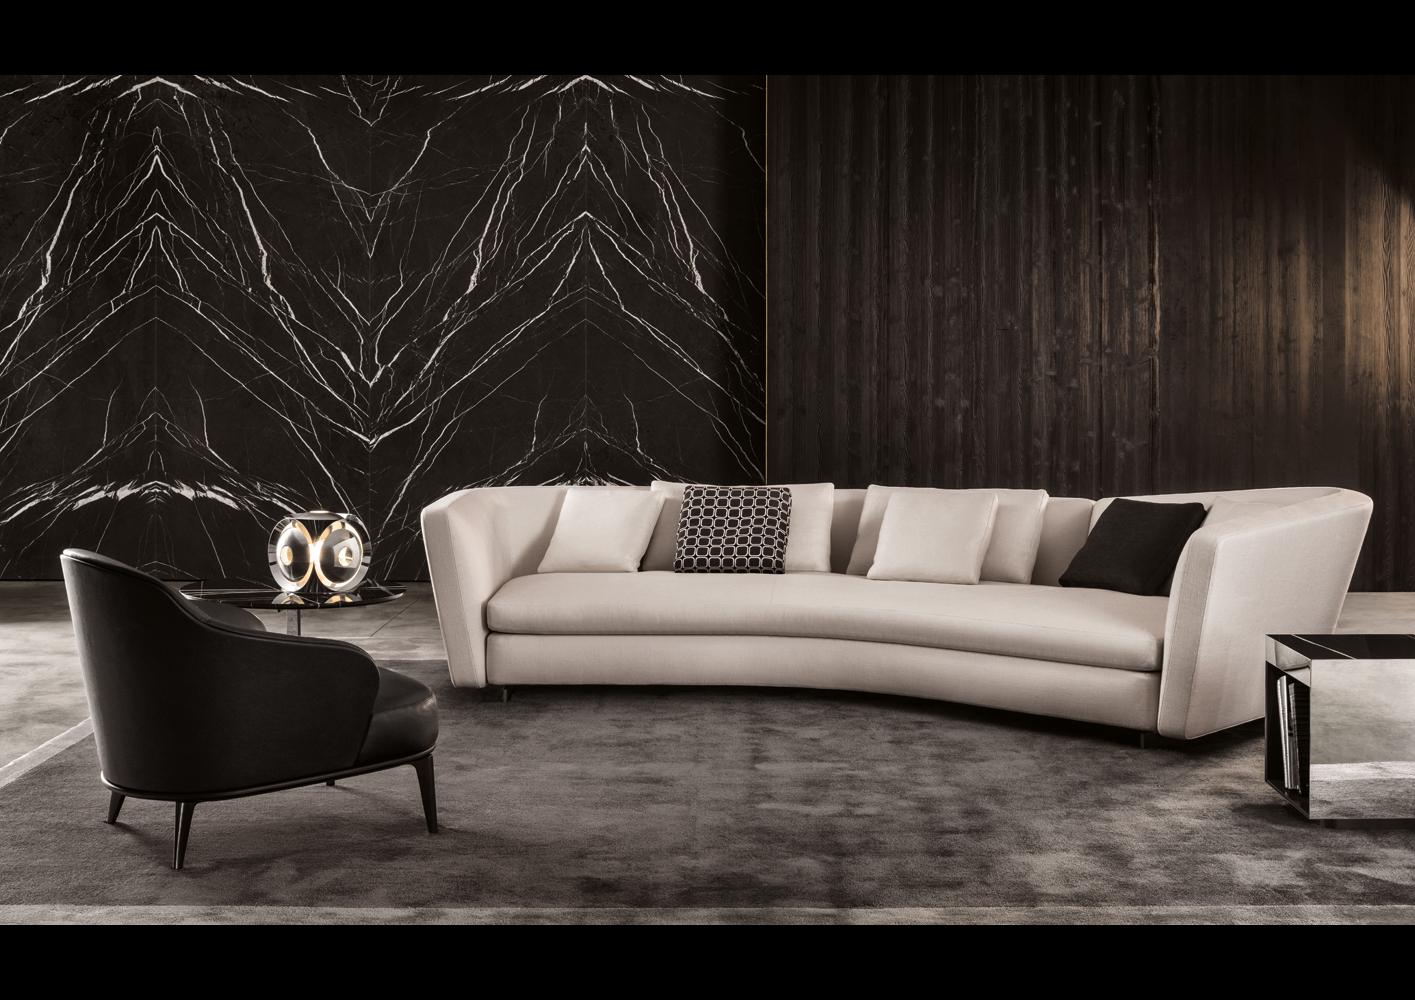 seymour sofa designed by rodolfo dordoni minotti. Black Bedroom Furniture Sets. Home Design Ideas